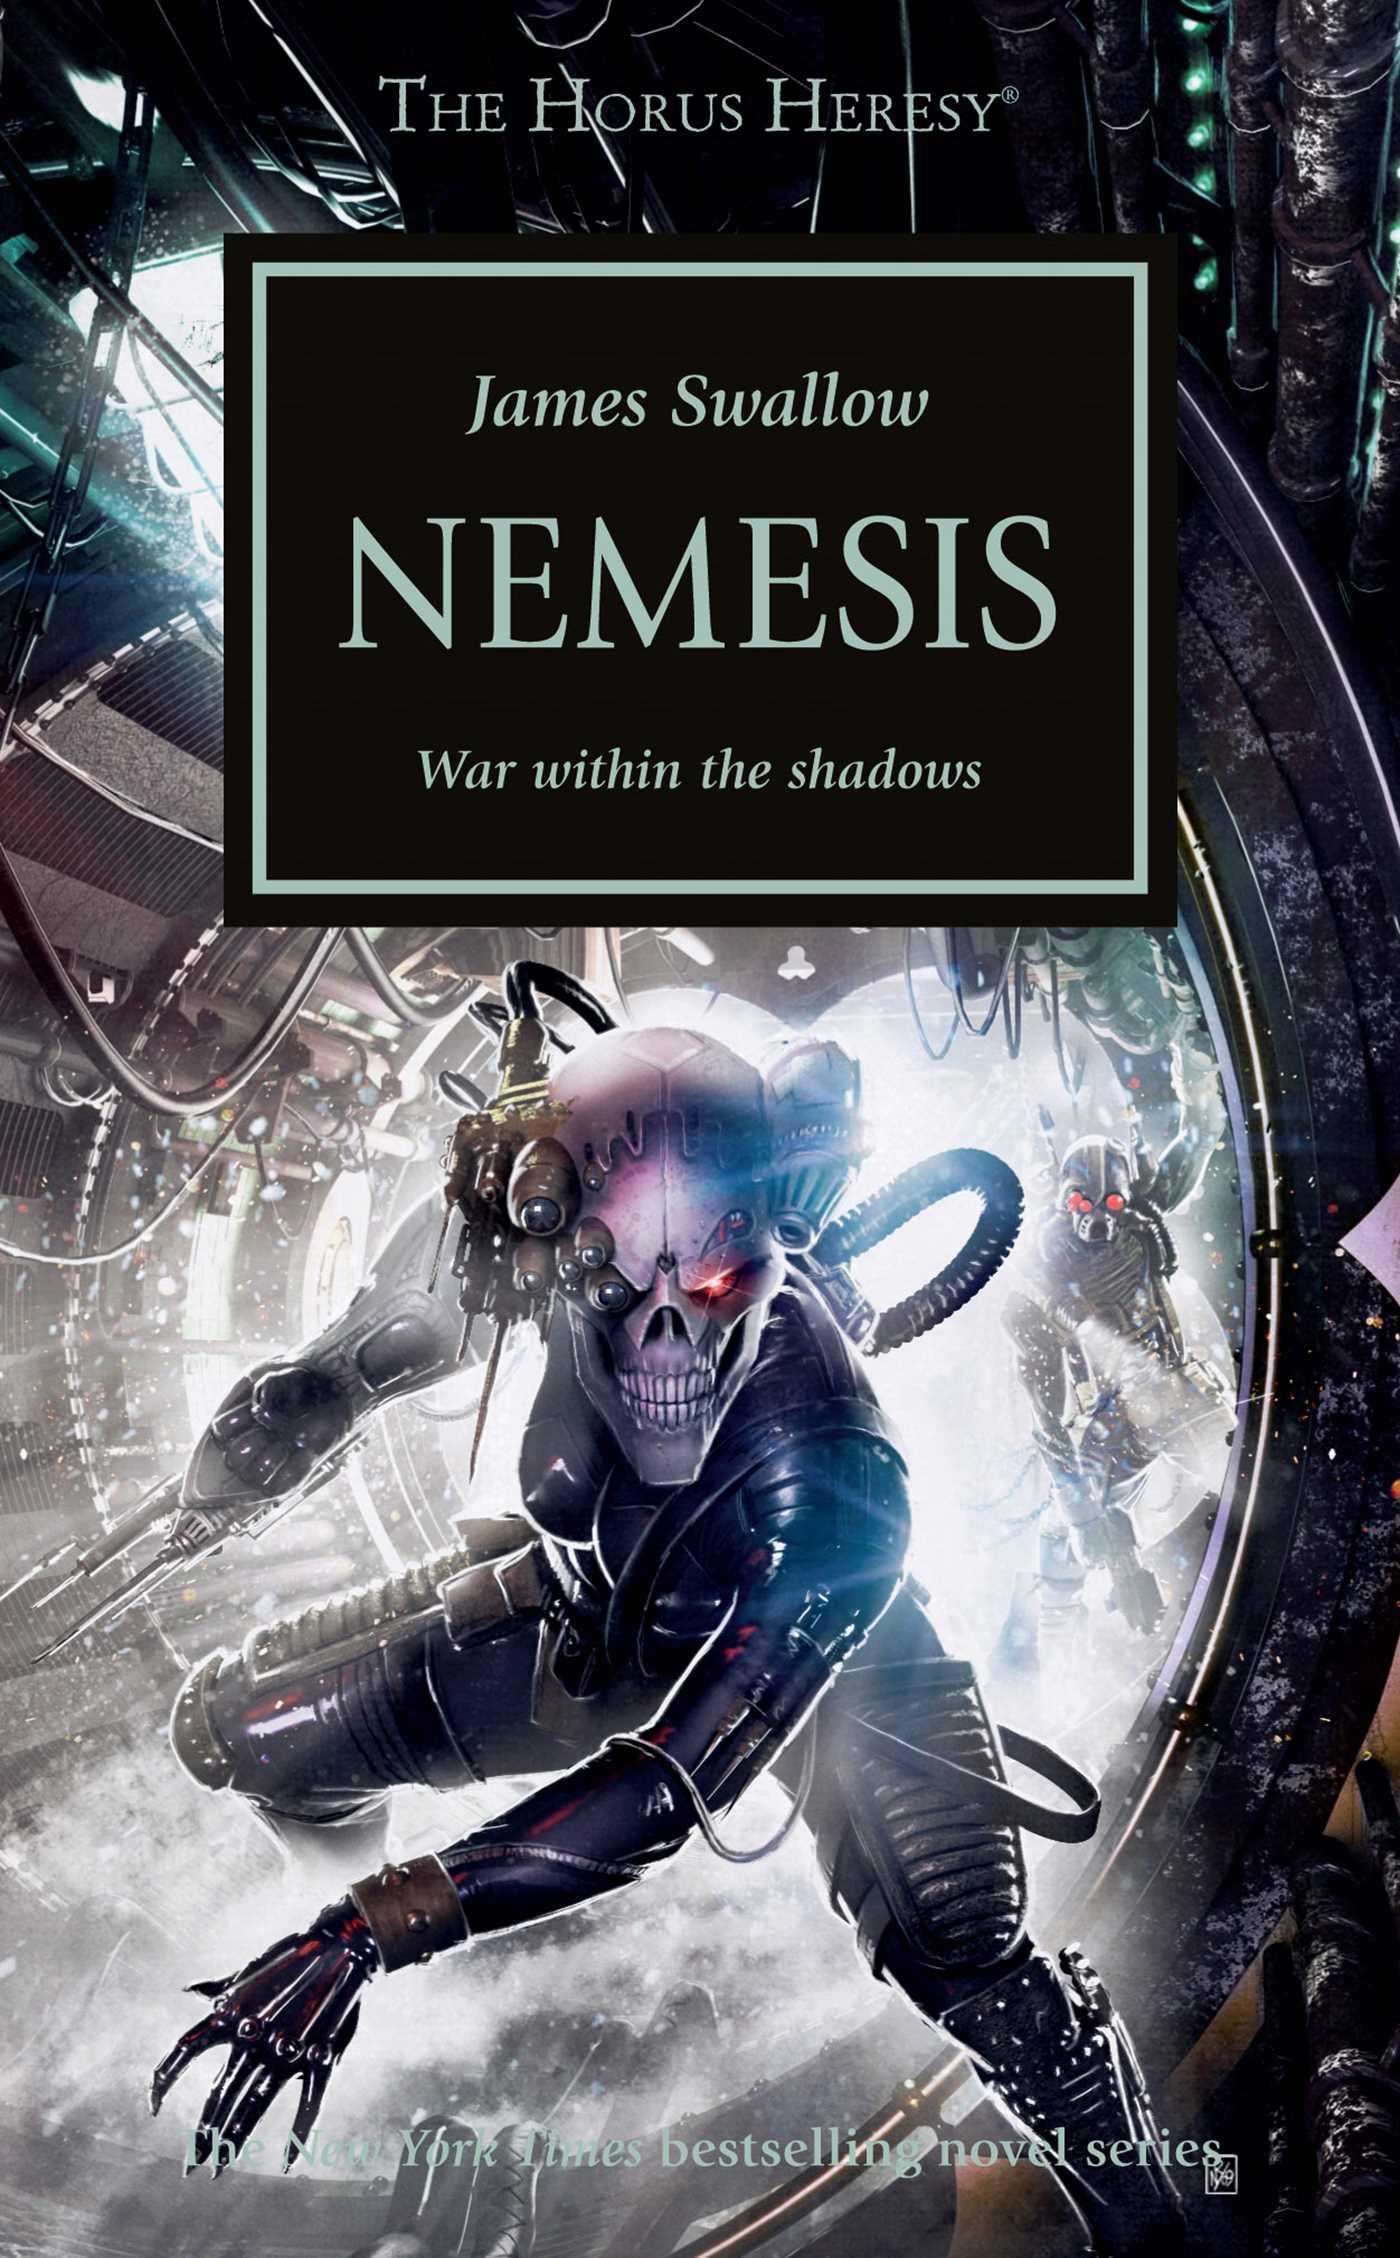 Nemesis 9781849708241 hr